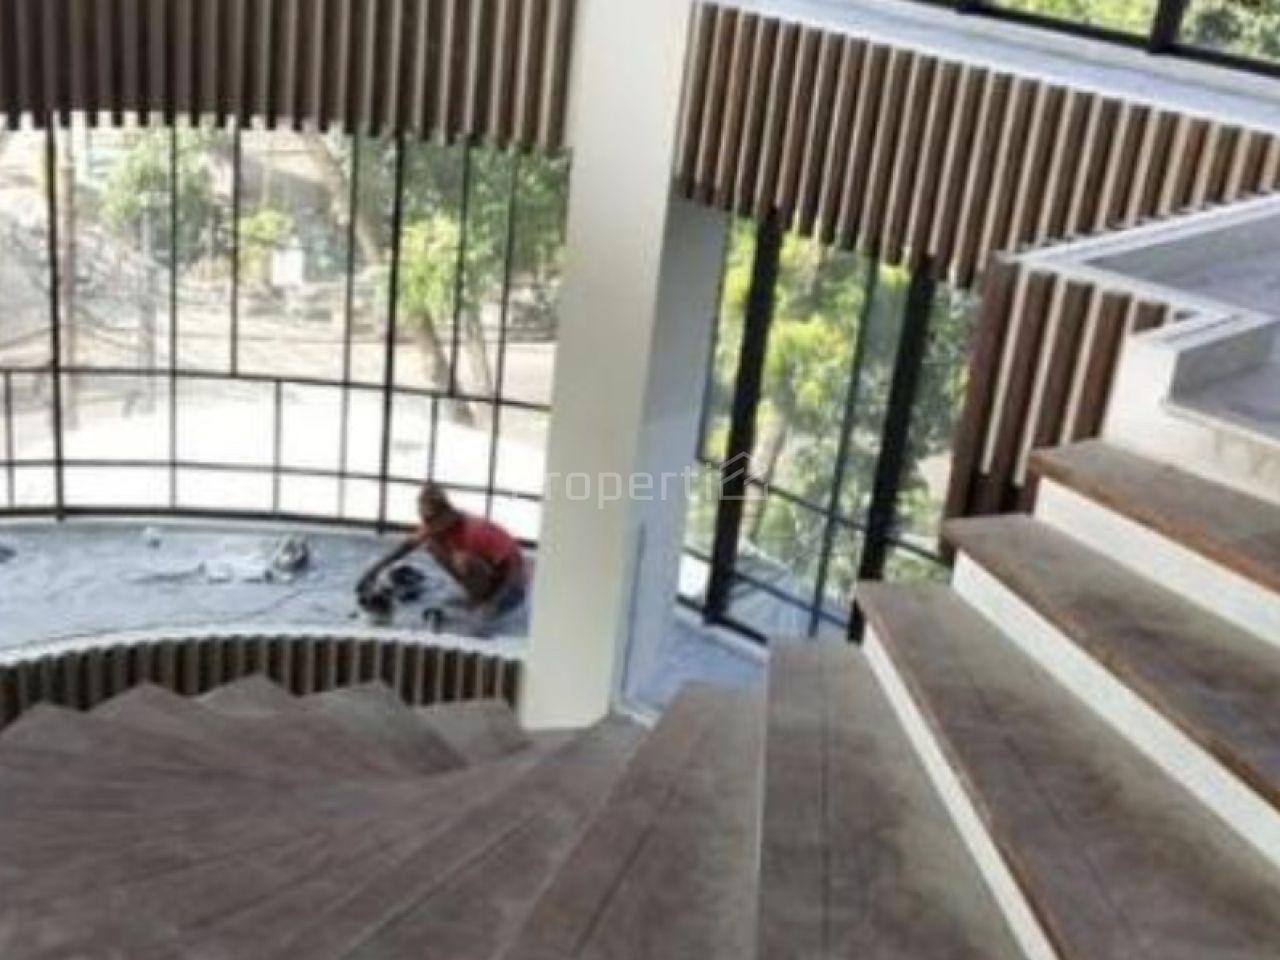 Gedung Baru di Dharmawangsa, Kebayoran Baru, DKI Jakarta